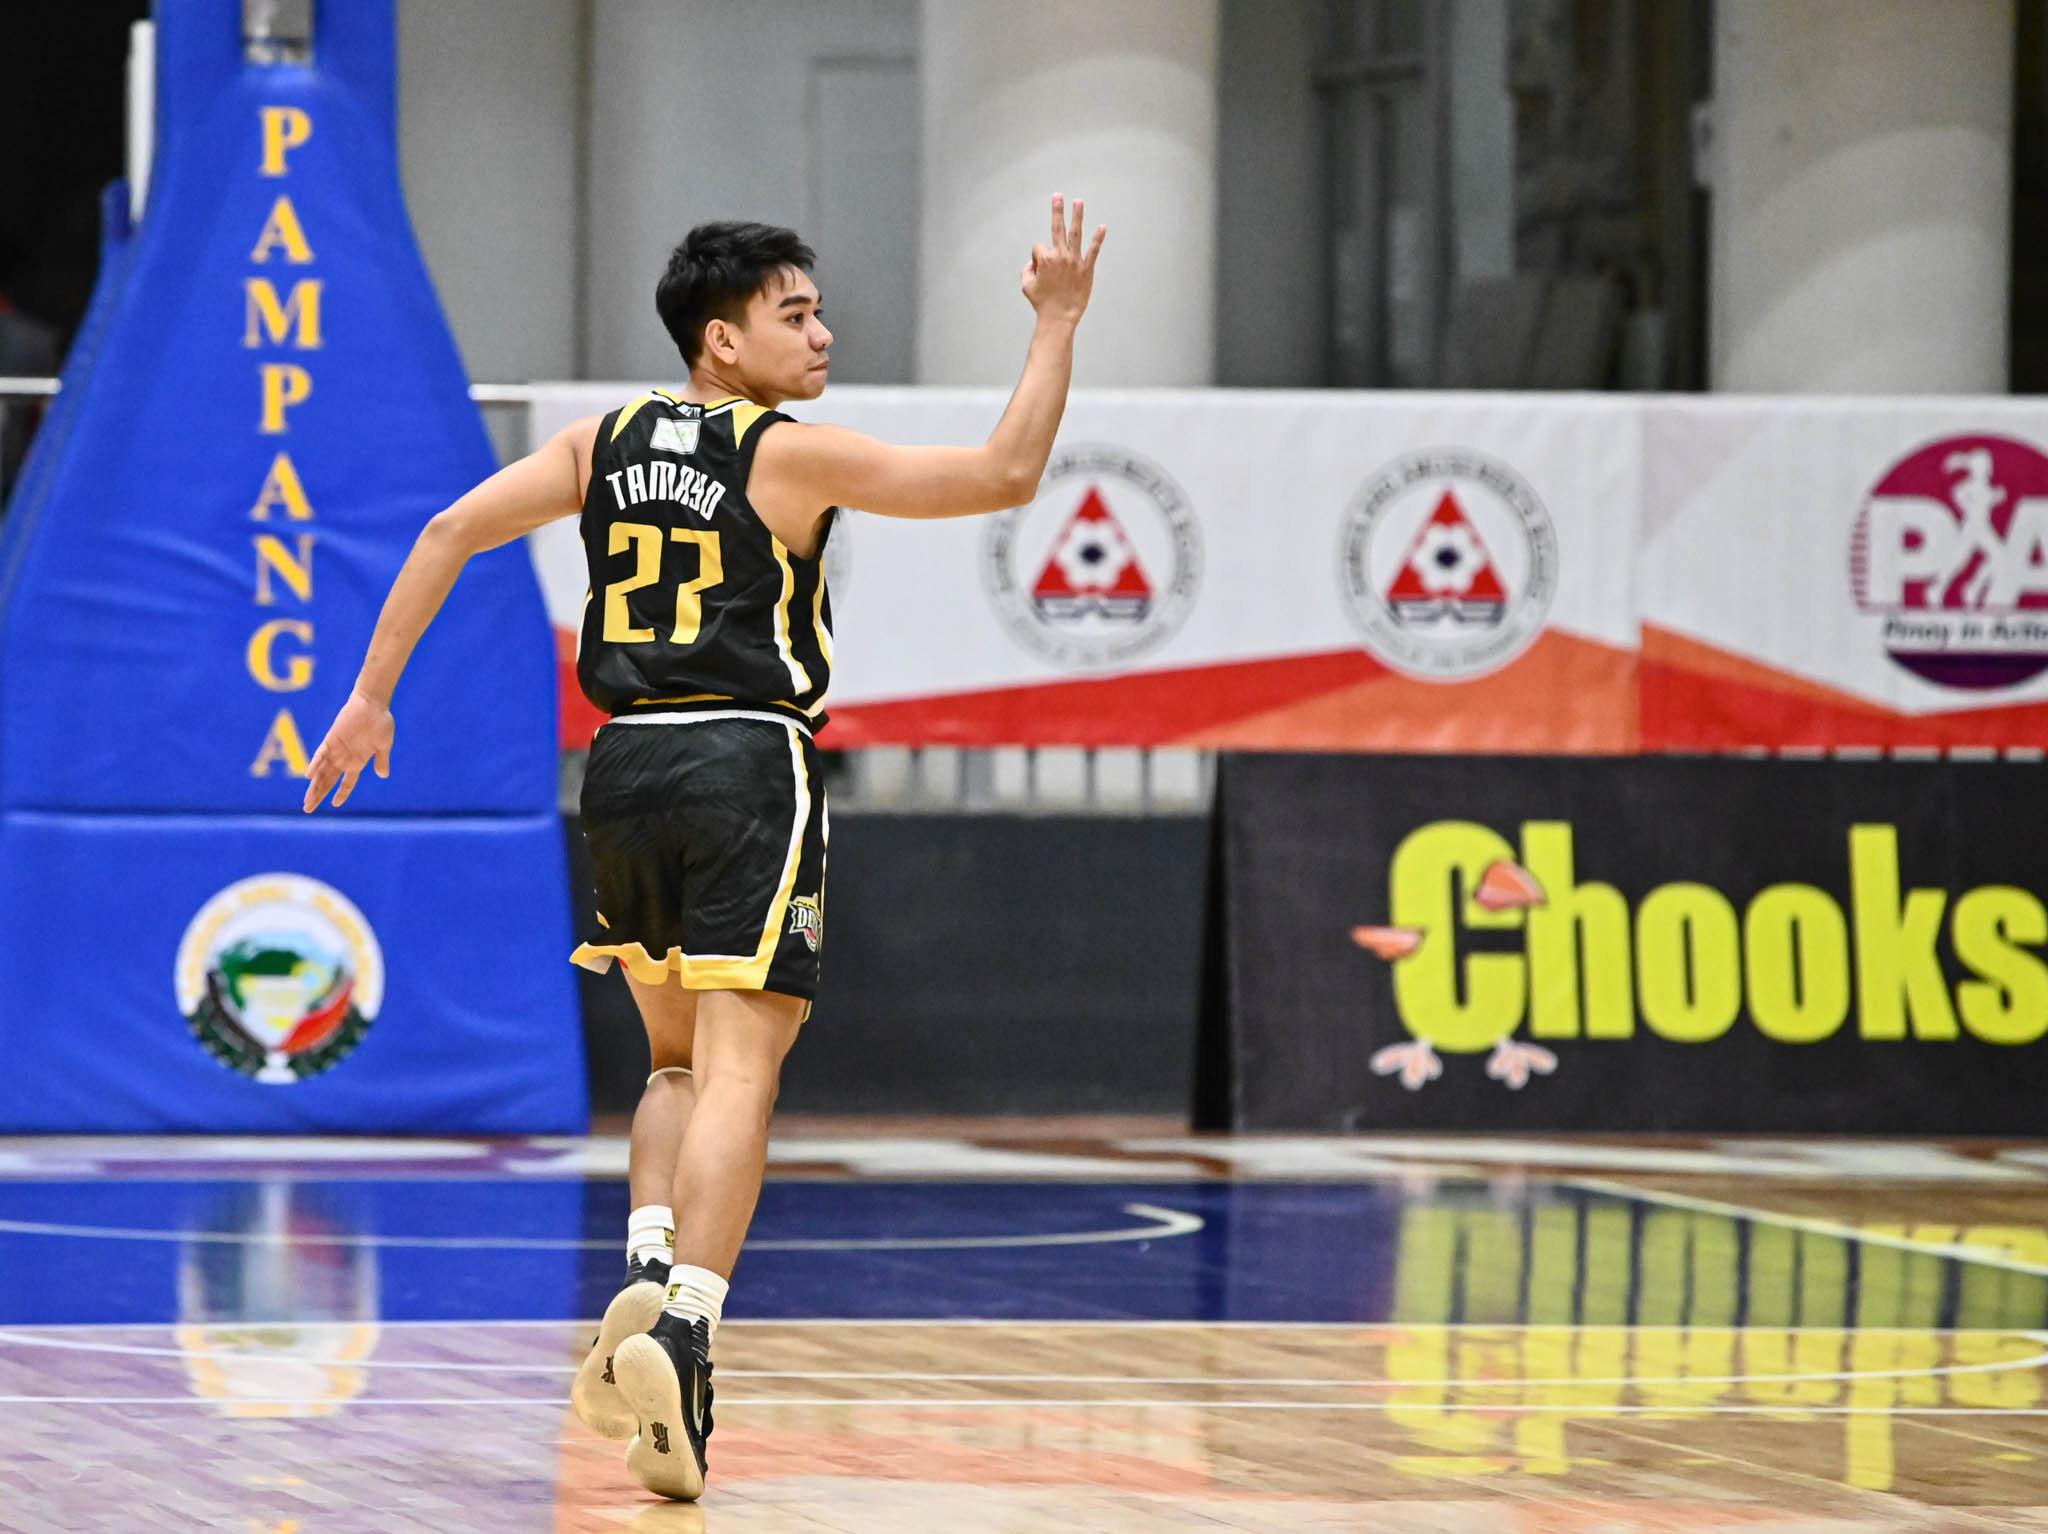 2021-Chooks-NBL-Bulacan-vs-Pampanga-Mark-Tamayo Mark Tamayo's halfcourt prayer does not count as Bulacan stuns Pampanga in NBL Basketball NBL News  - philippine sports news